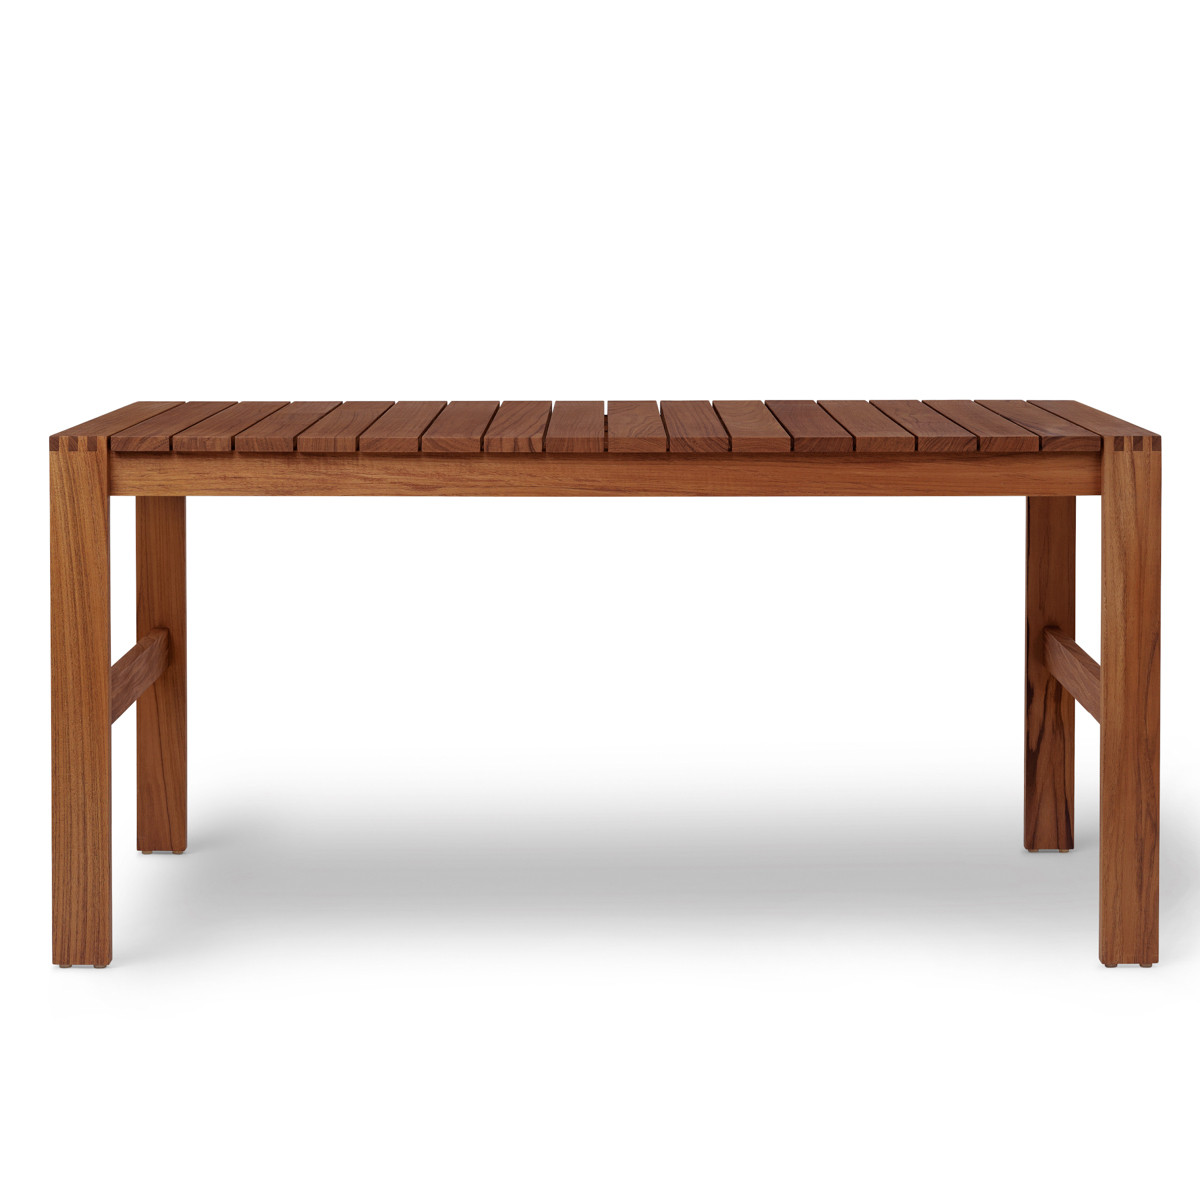 Carl Hansen BK15 Dining Table